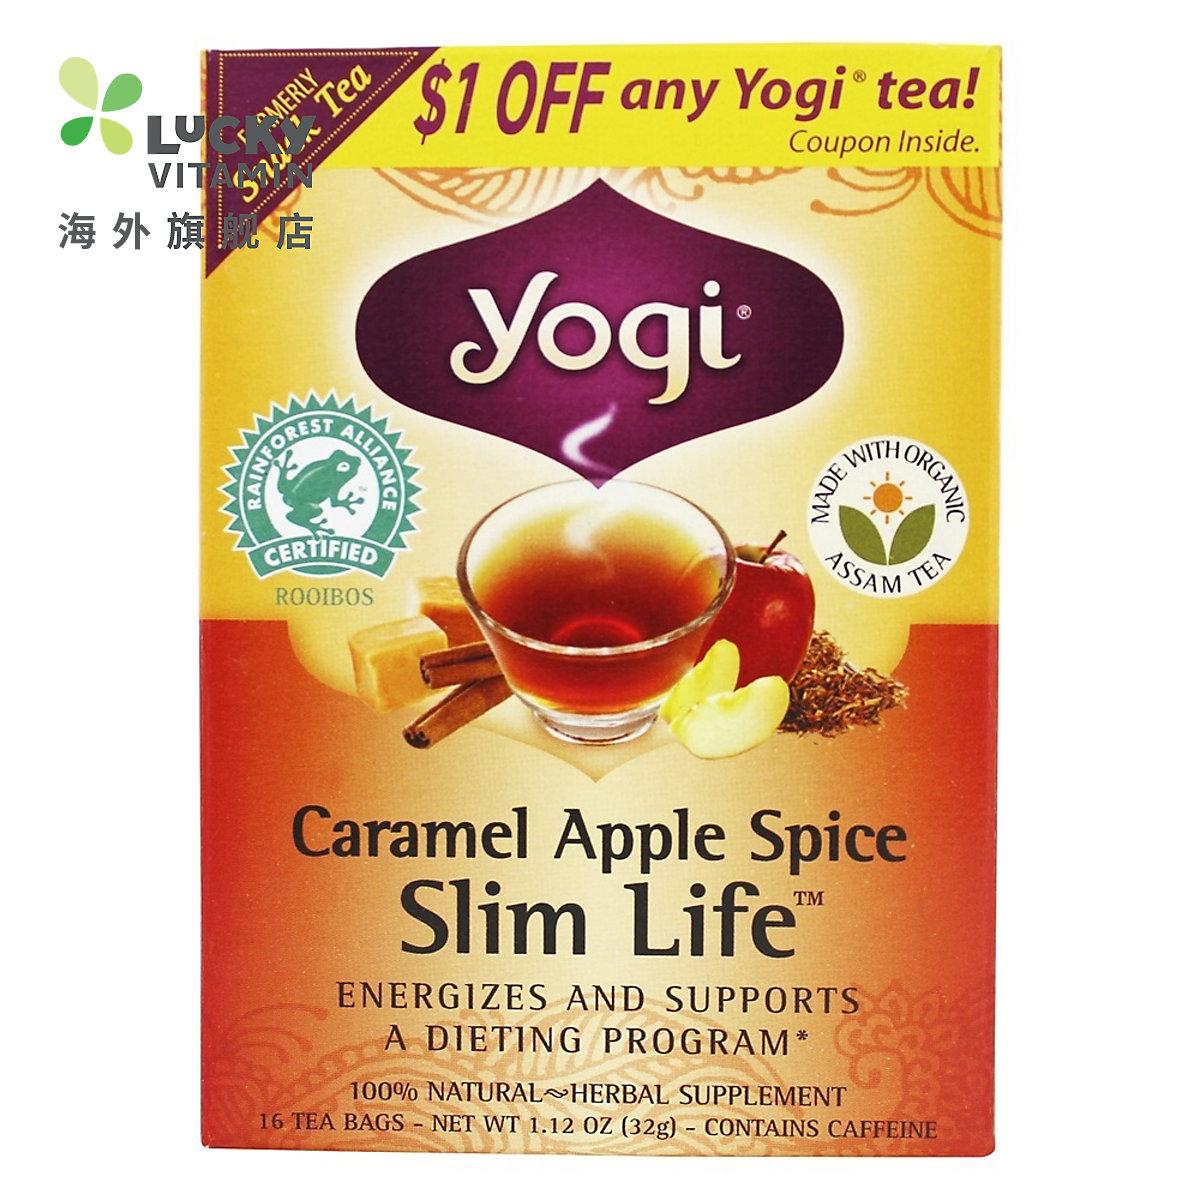 Yogi Tea焦糖蘋果瑜伽瘦身纖體茶燃脂瘦身香甜美味16袋美國